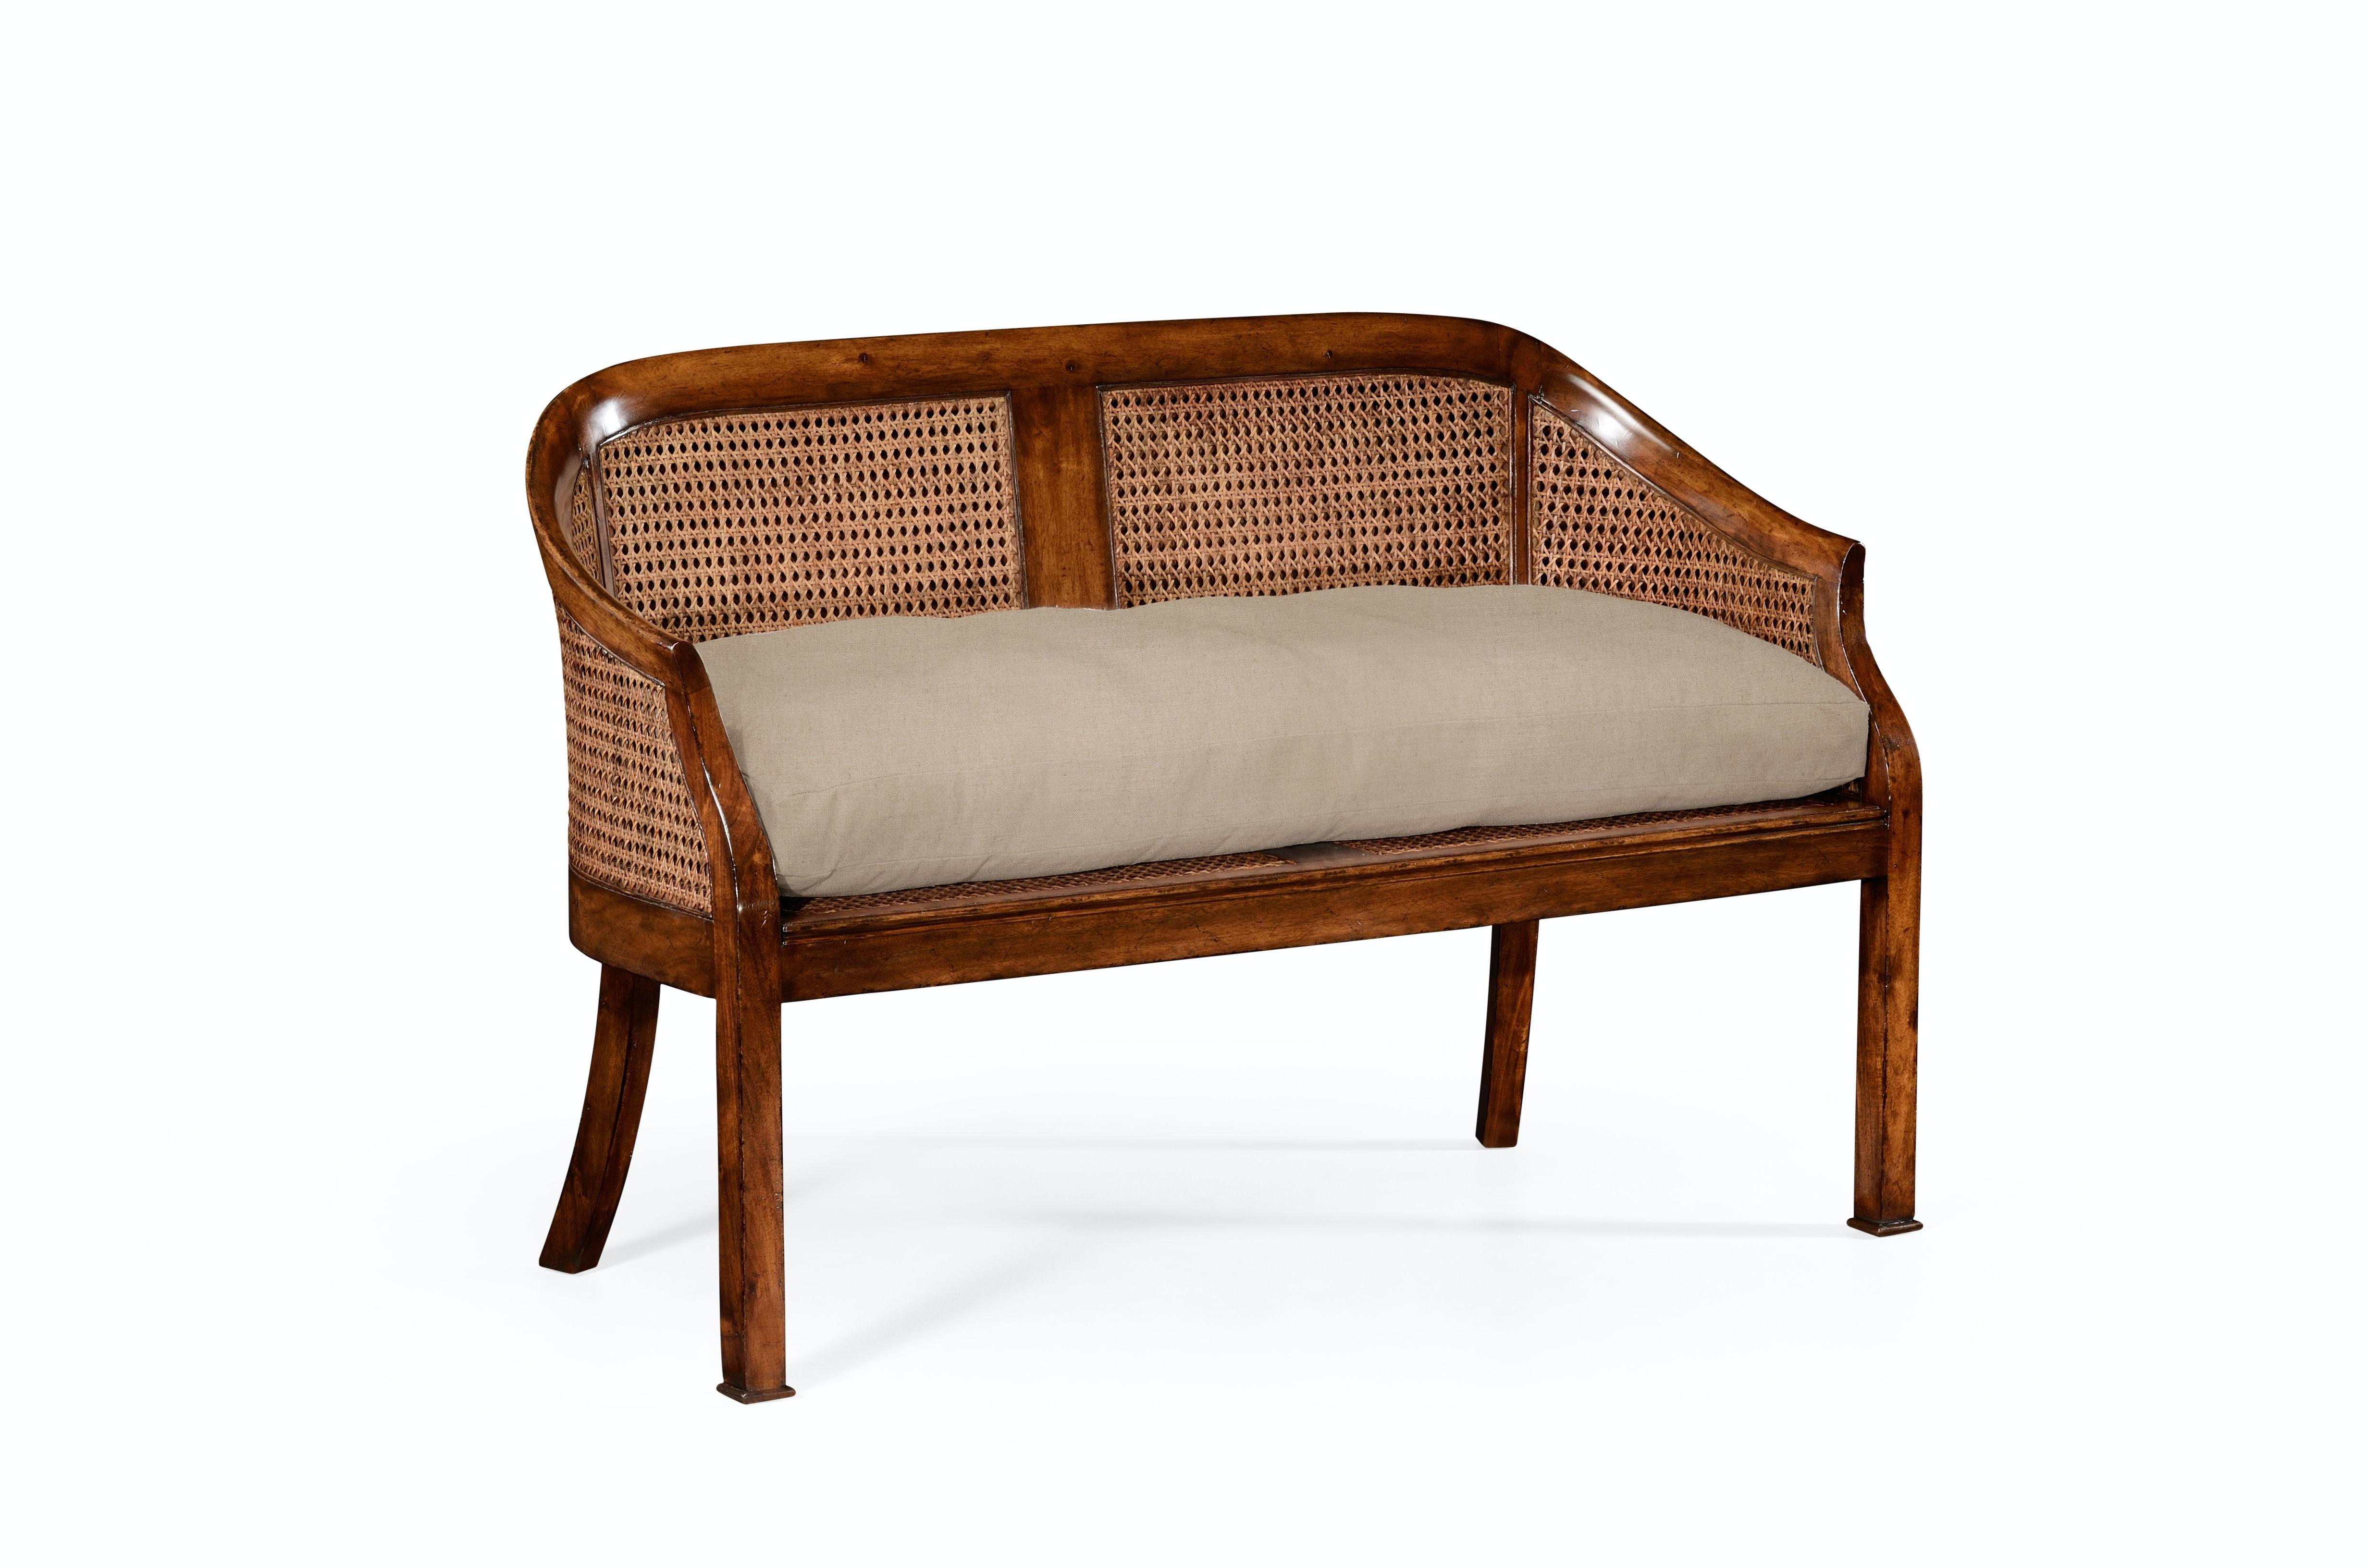 Jonathan Charles Walnut 2 Seater Salon Settee Cane Back Upholstered Seat  492247 WAL